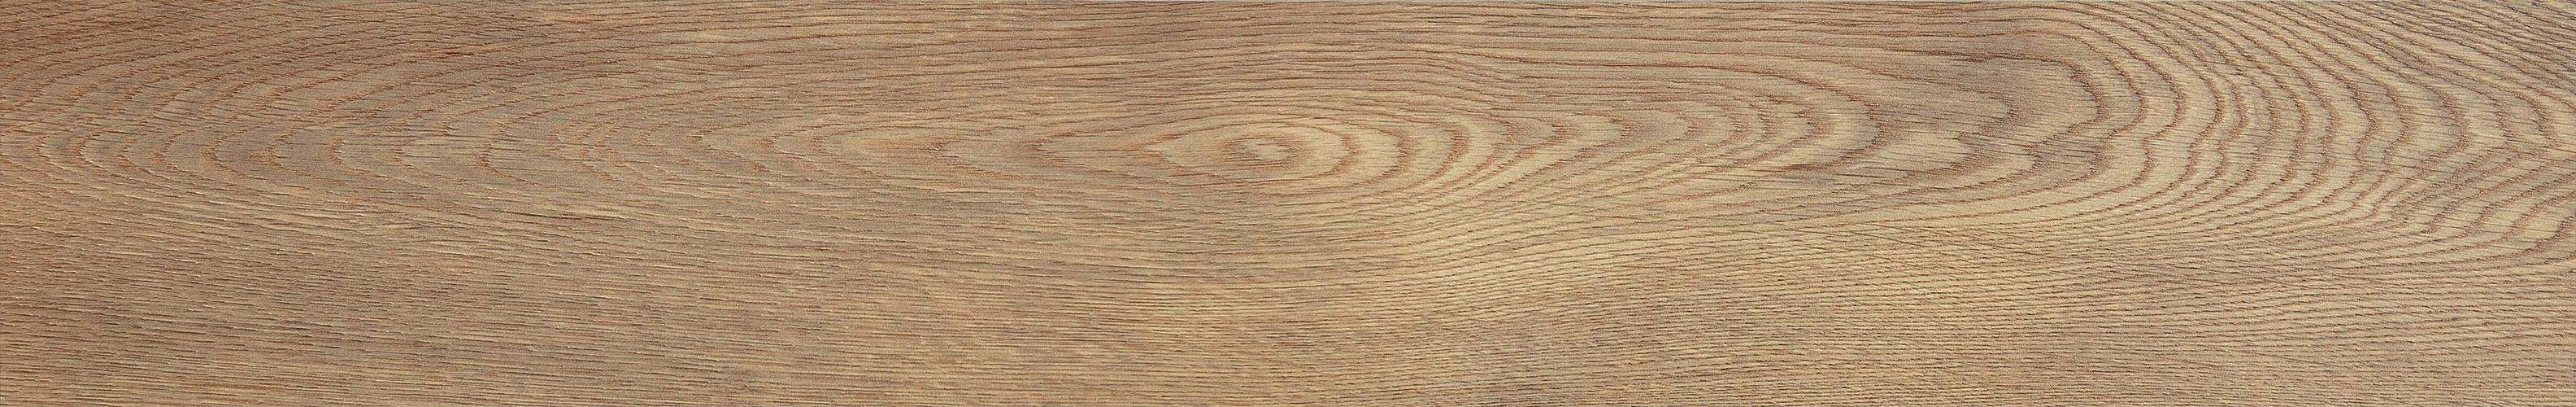 Pueblo wood brown STR